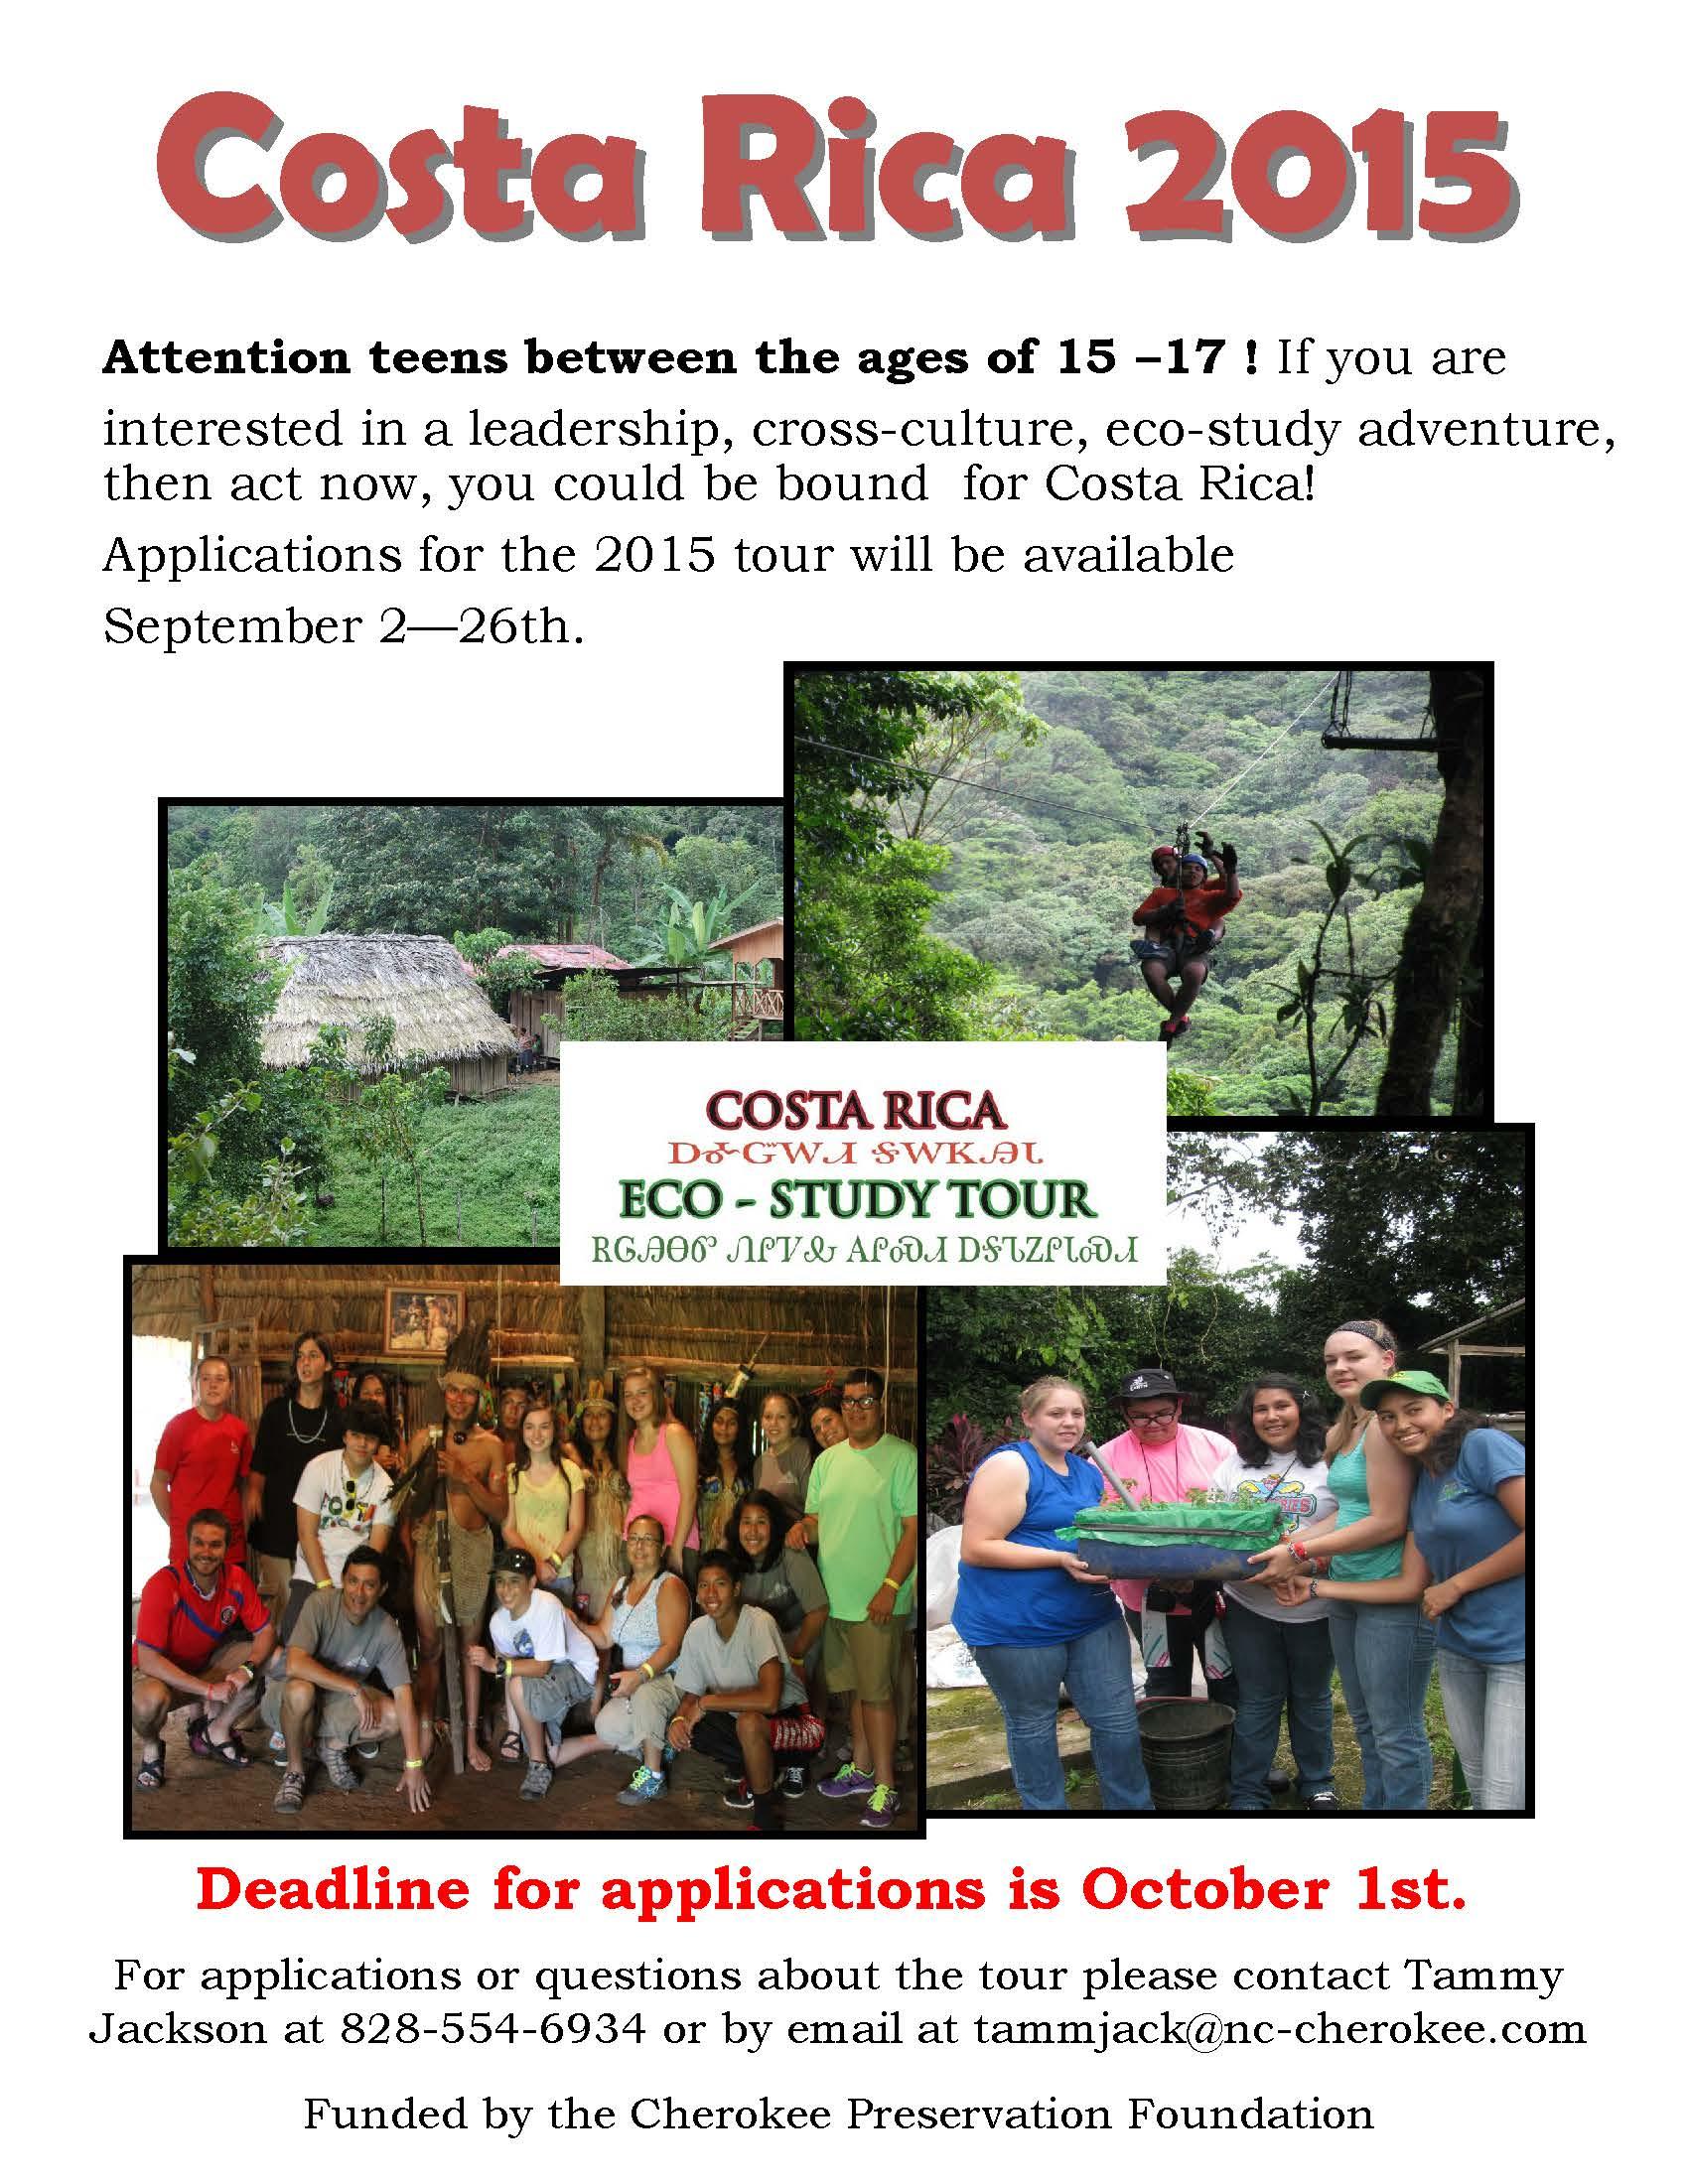 Costa Rica flyer 2015